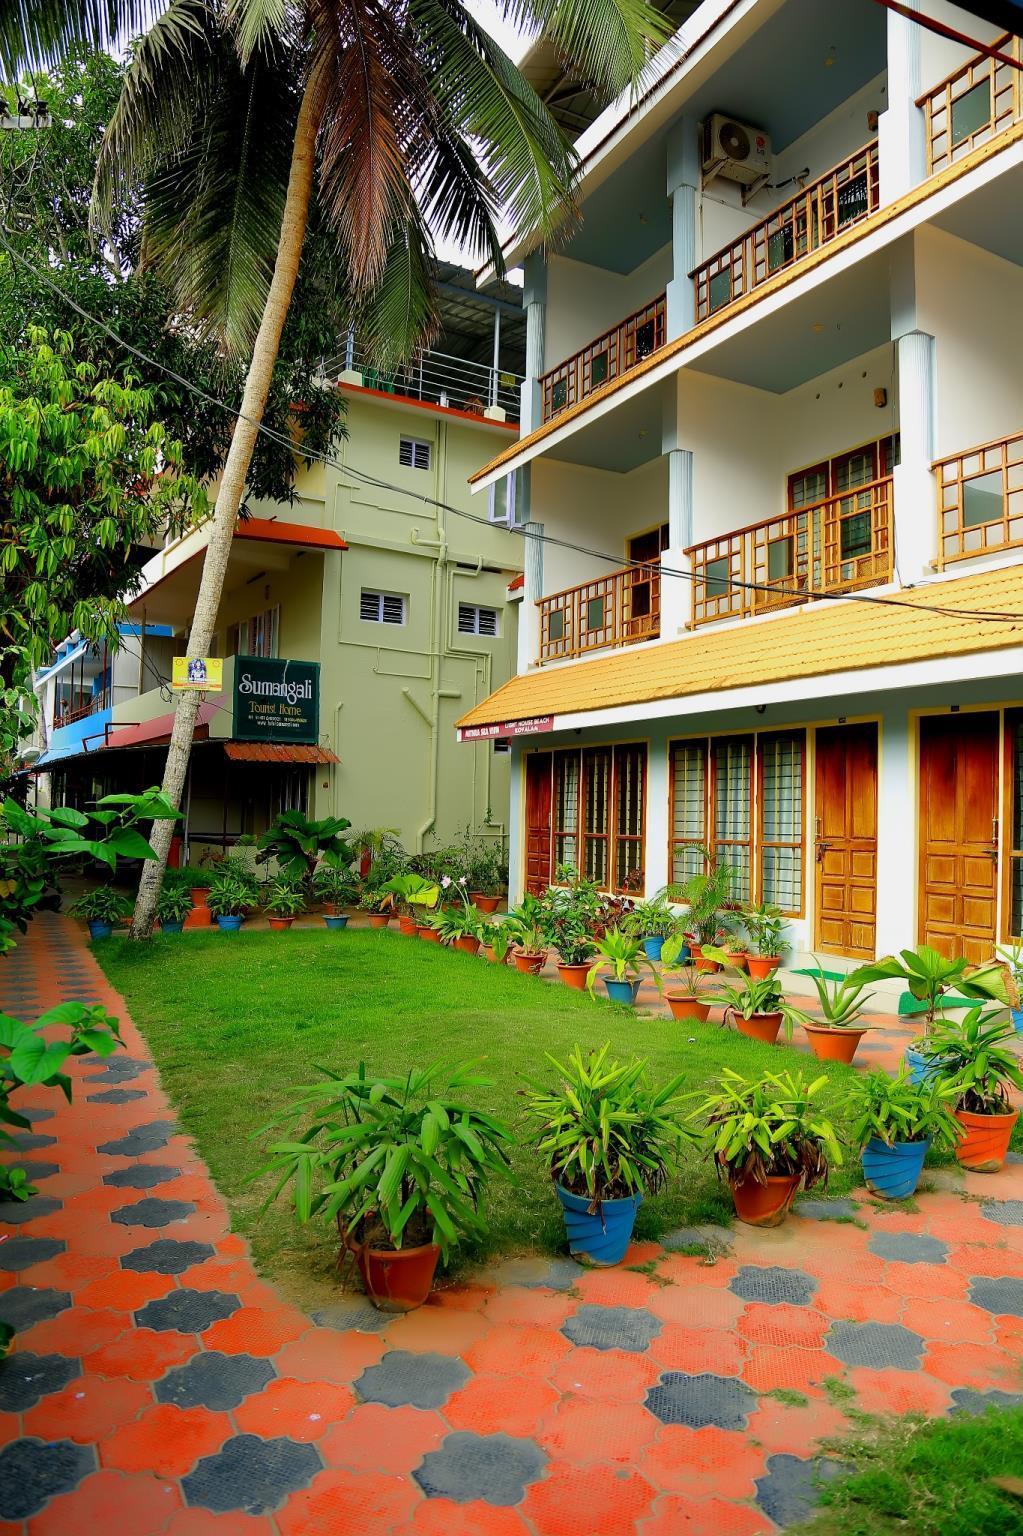 Price Hotel Sumangali